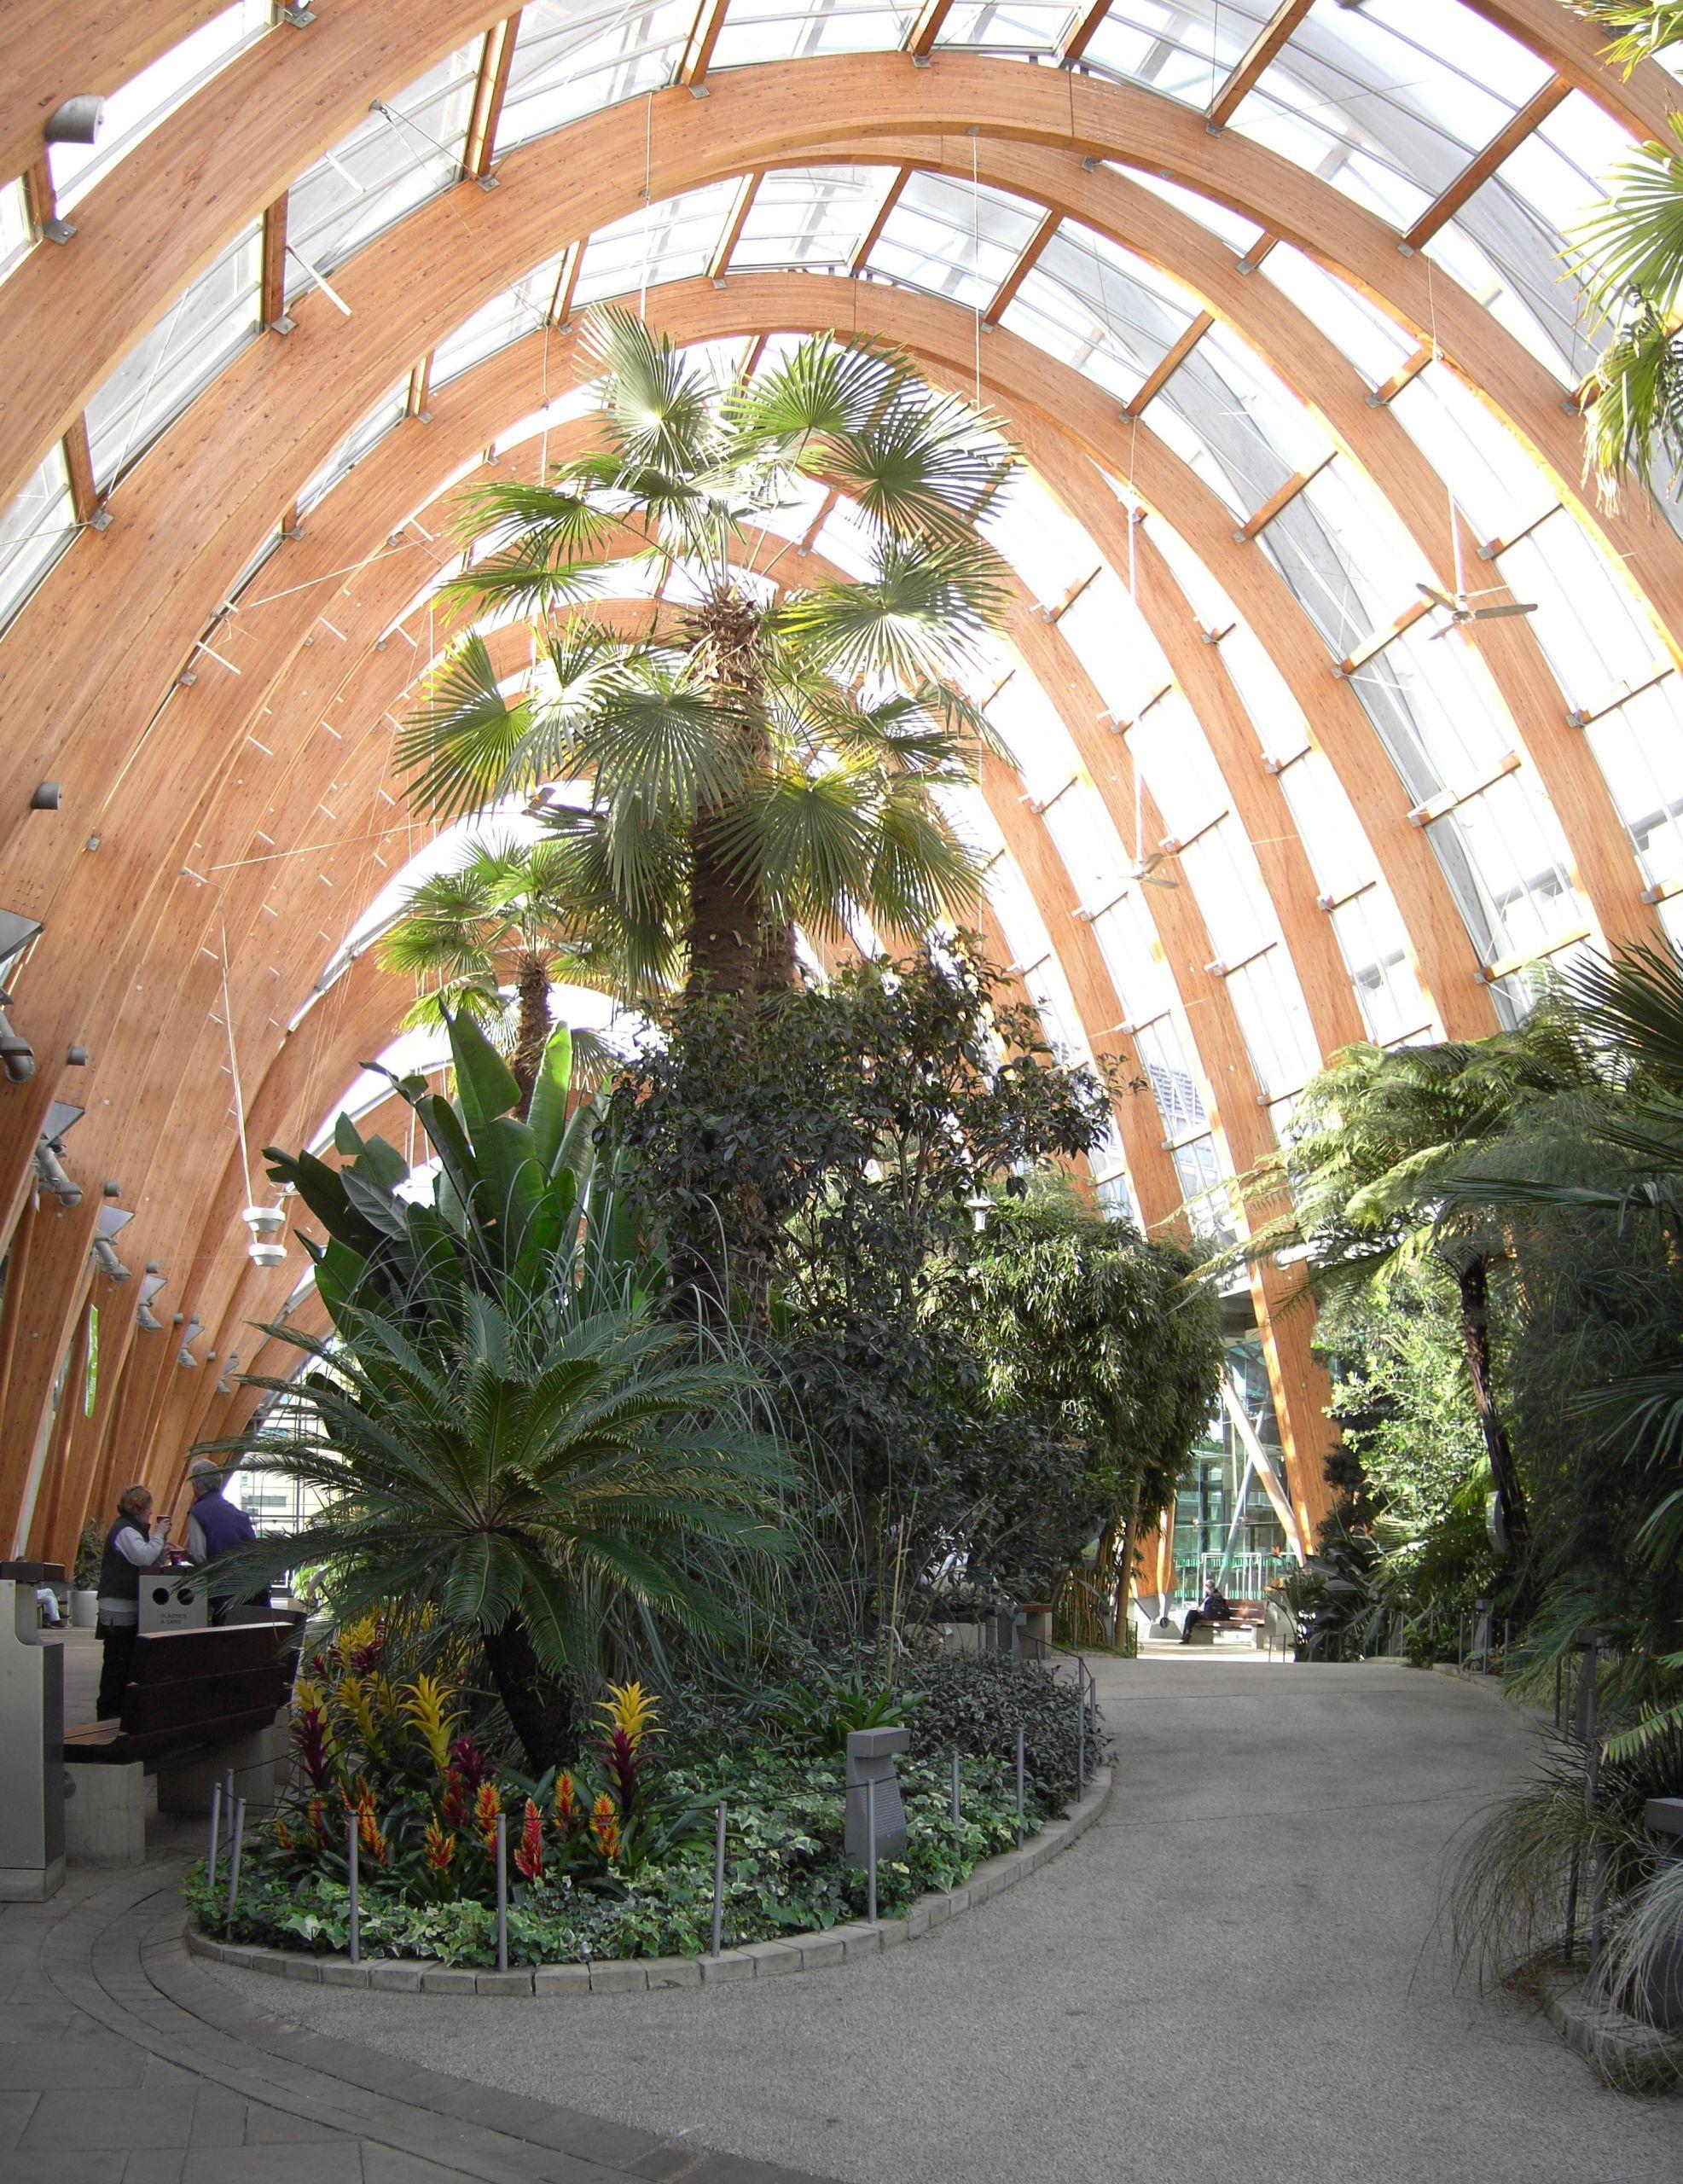 Sheffield Winter Garden